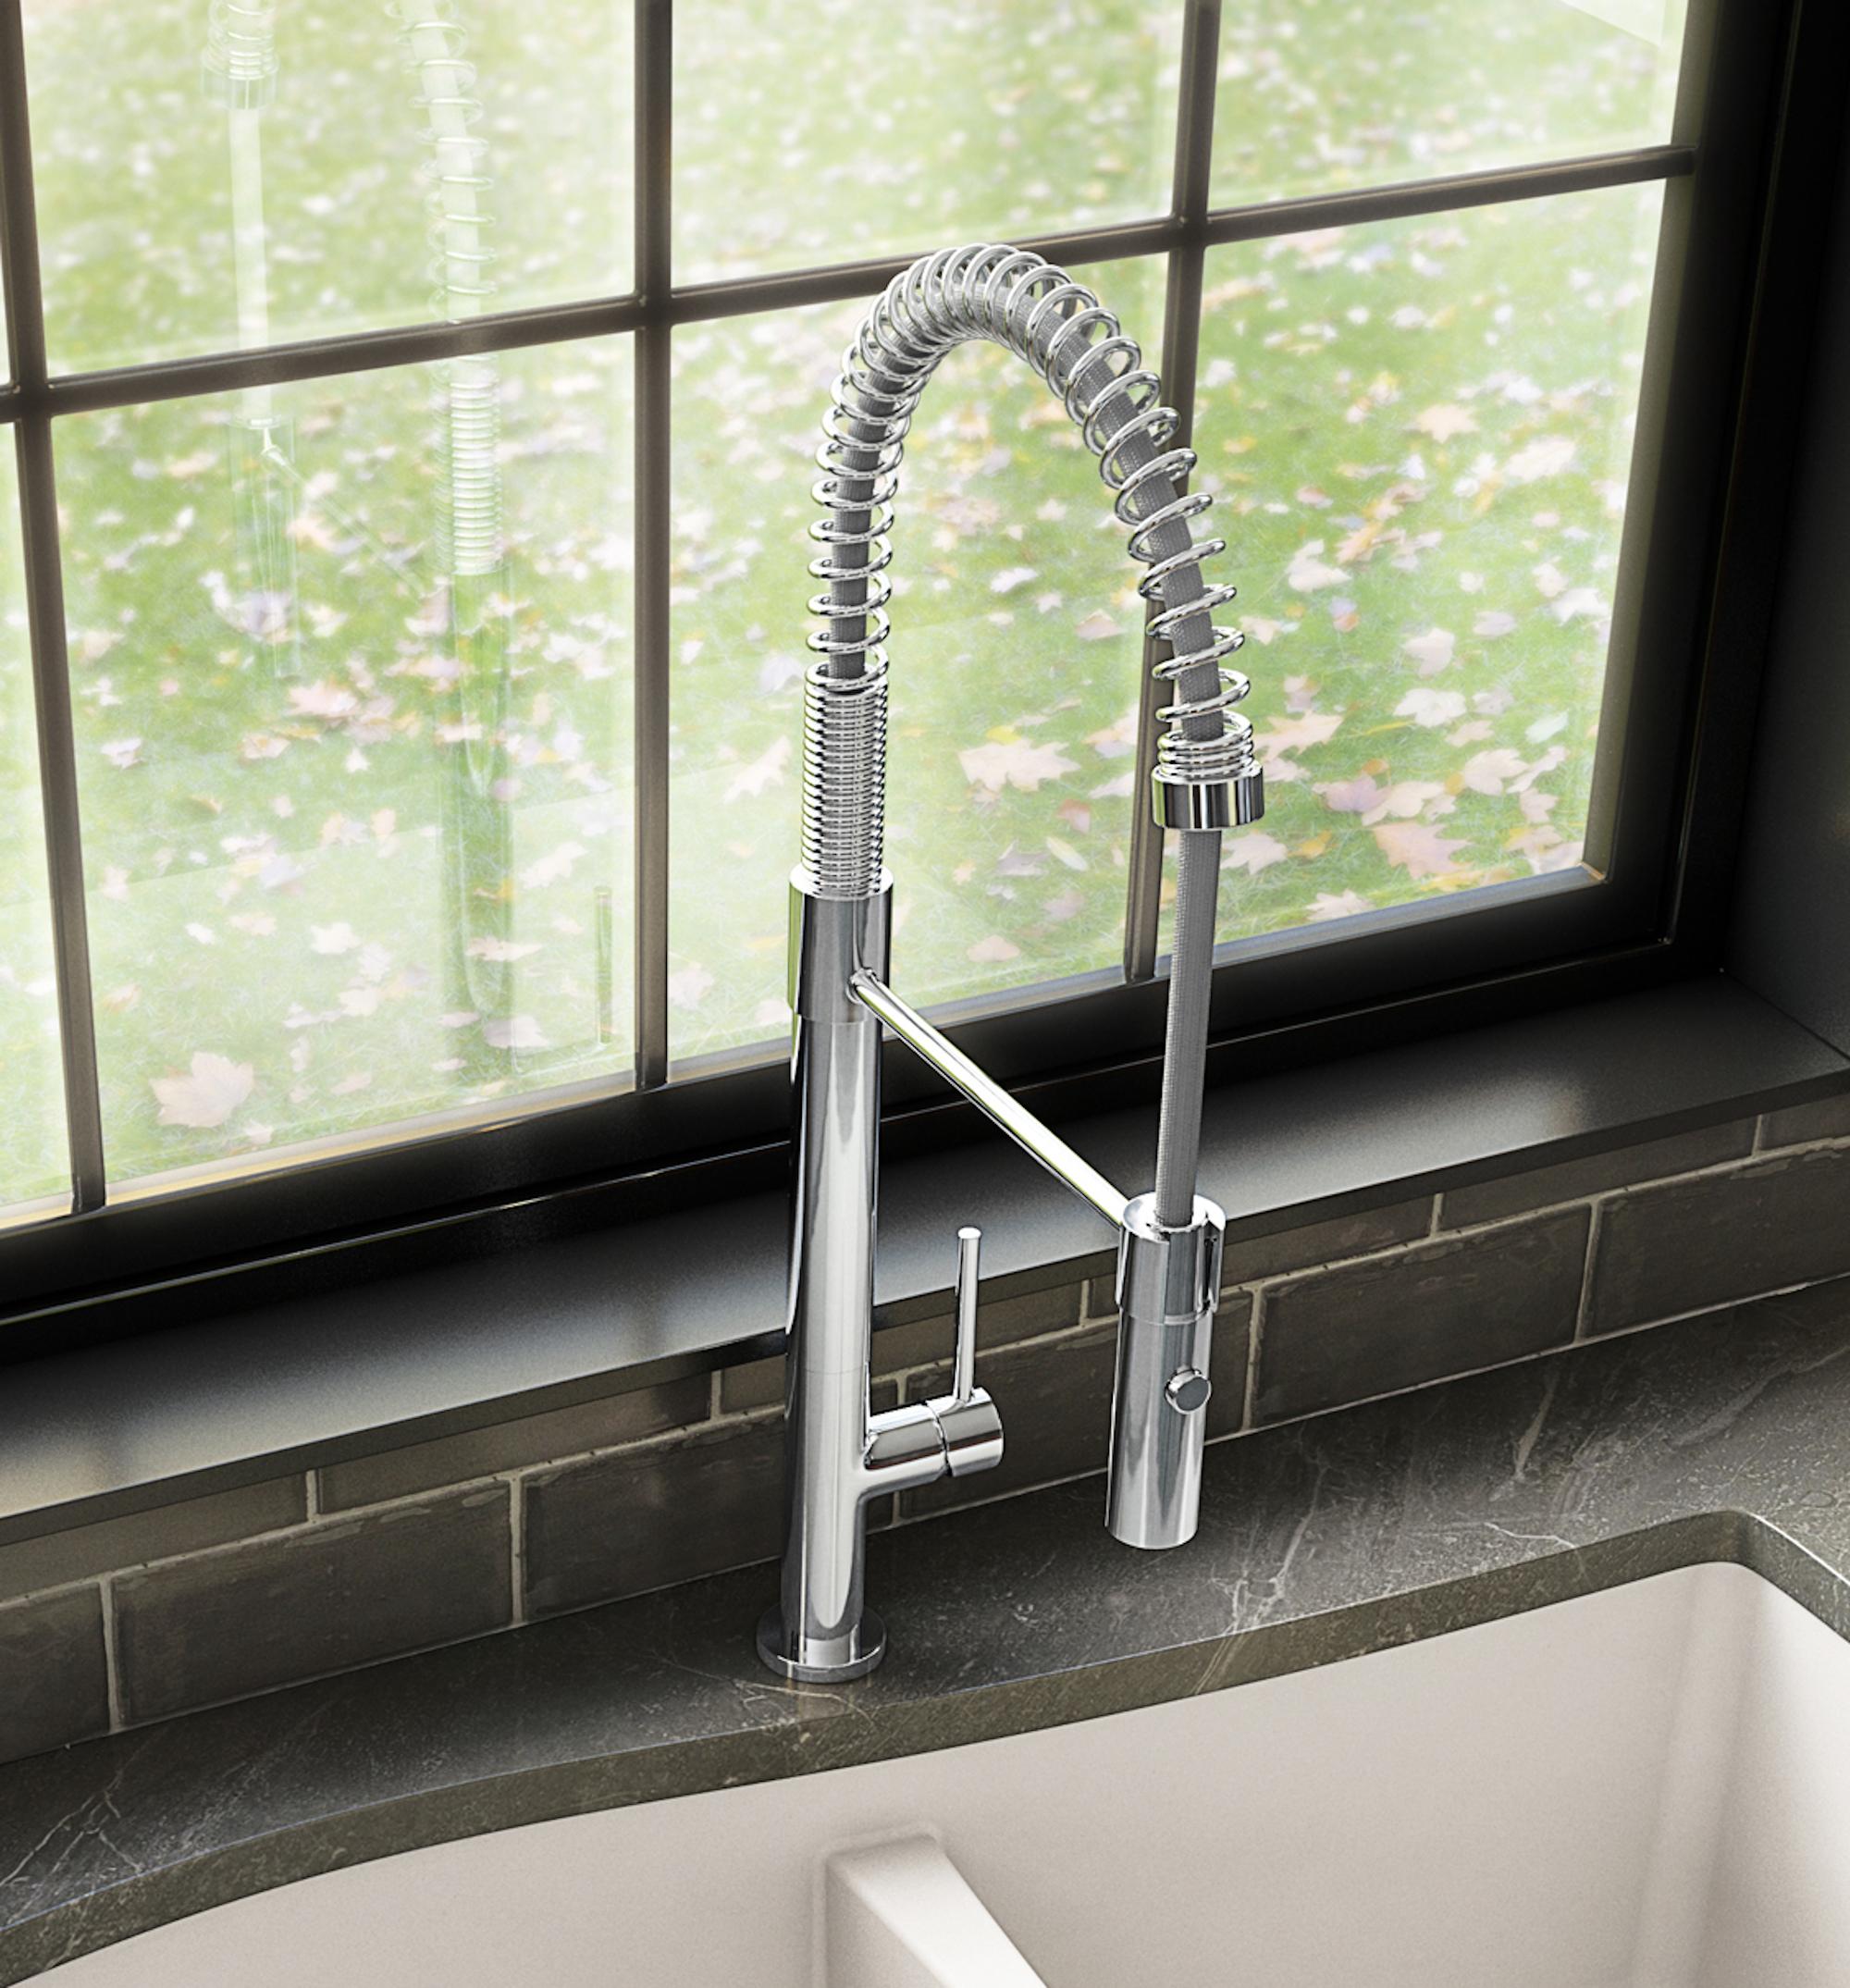 Karran Bluffton Single Lever Handle Lead-free Brass ADA Kitchen Faucet, Pull Down, Chrome, KKF220C